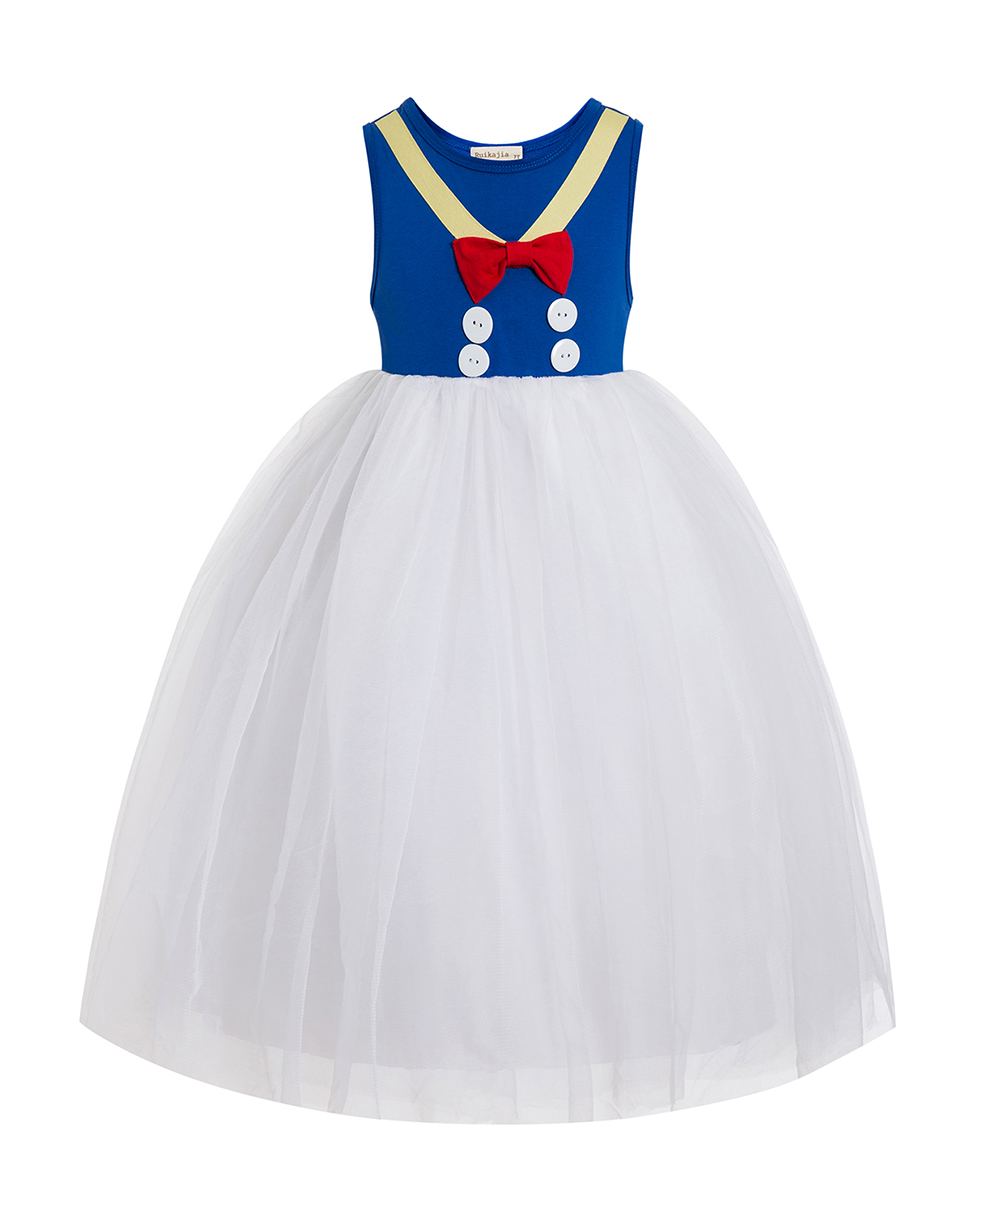 donland tutu dress (5)